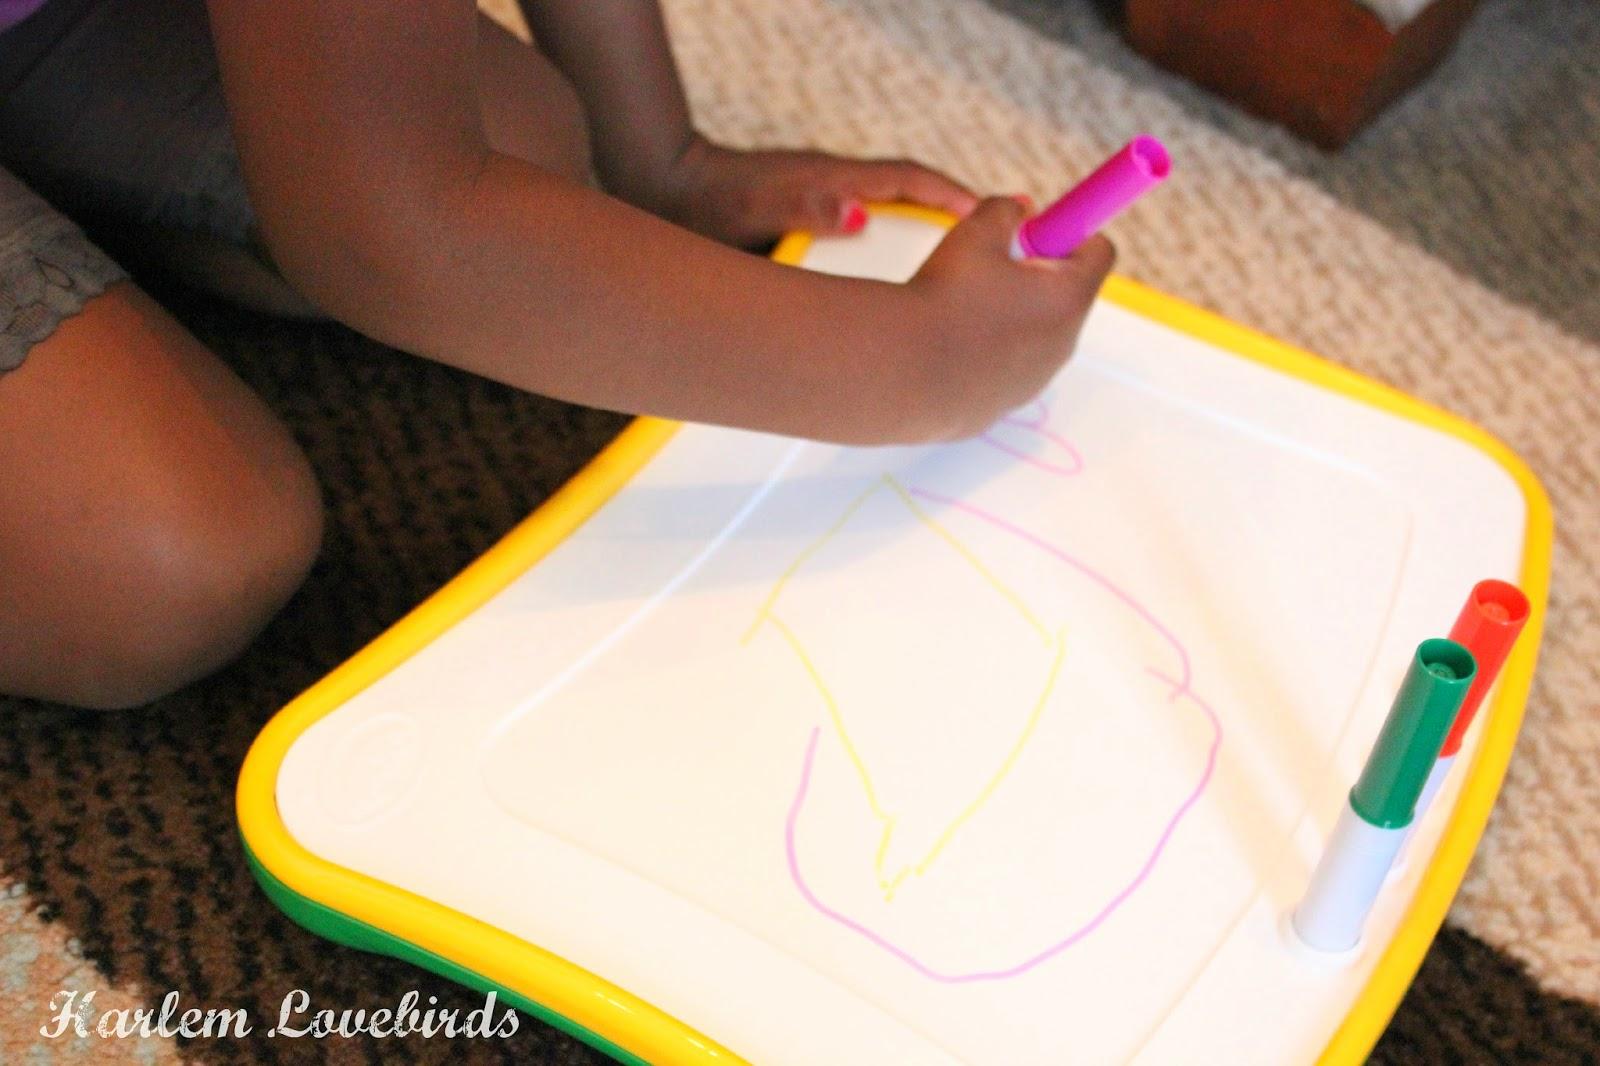 Harlem Lovebirds Getting Creative On The Go With Crayola